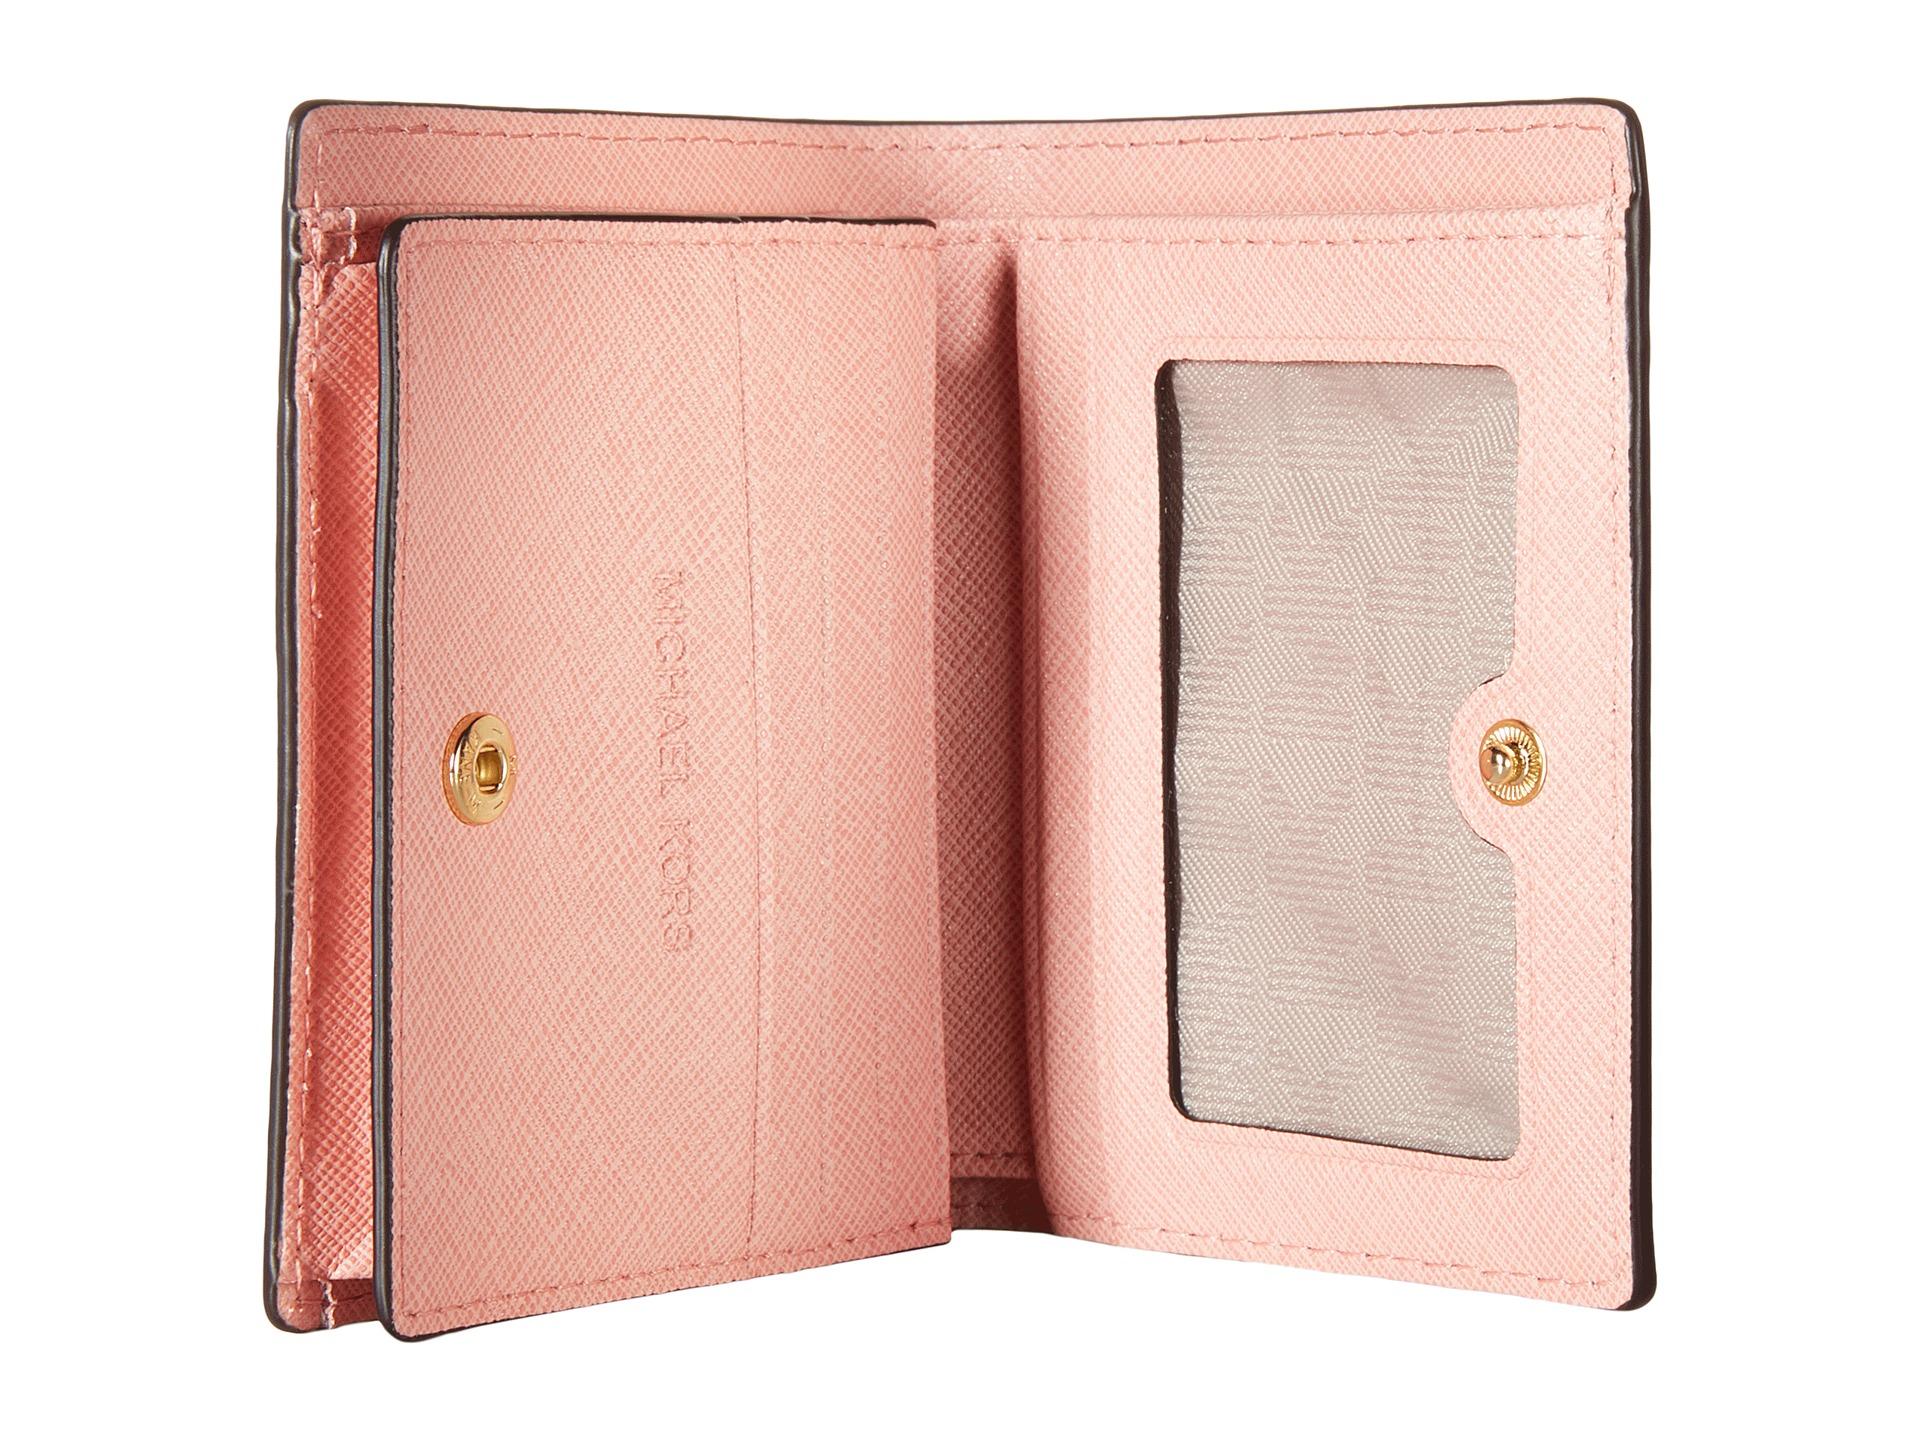 michael-michael-kors-pale-pink-jet-set-travel-flap-card-holder-pink-product-1-381781589-normal.jpeg